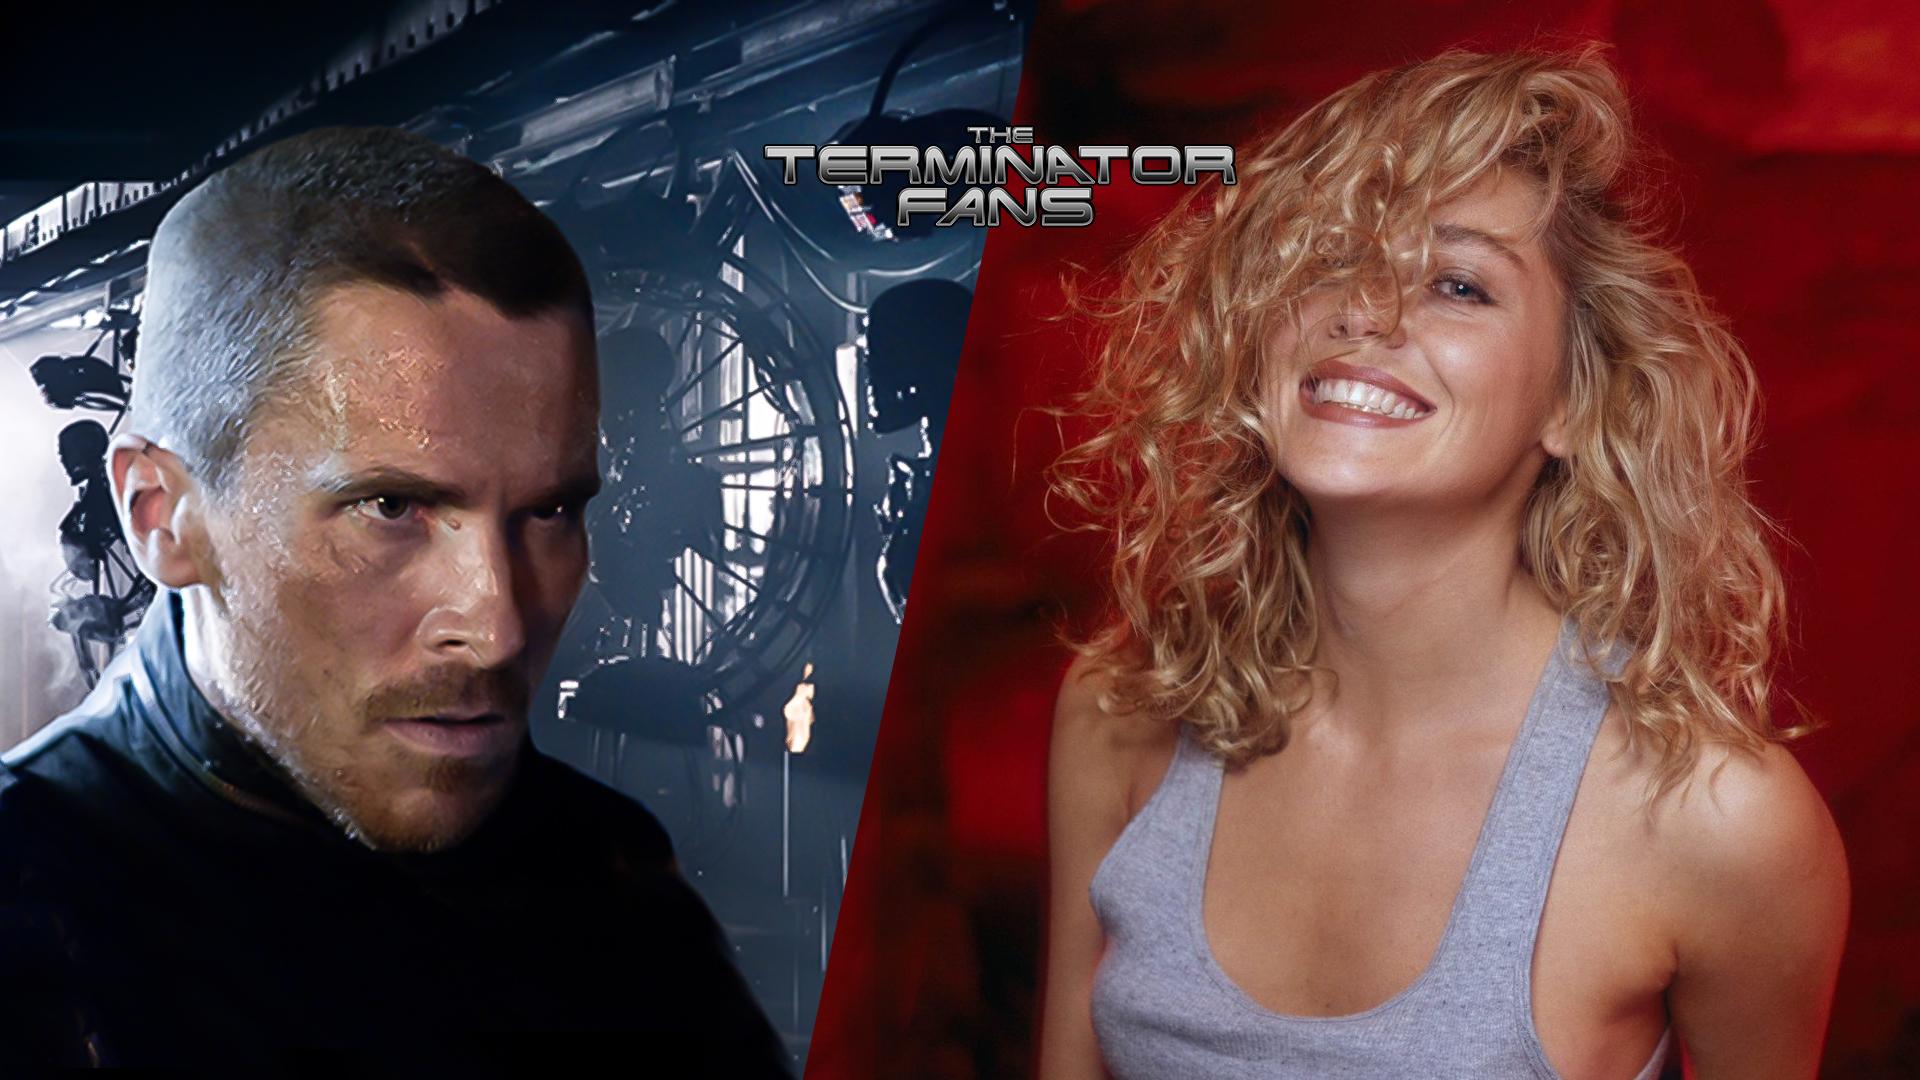 Terminator Salvation: Sharon Stone Defends Christian Bale On-Set Rant